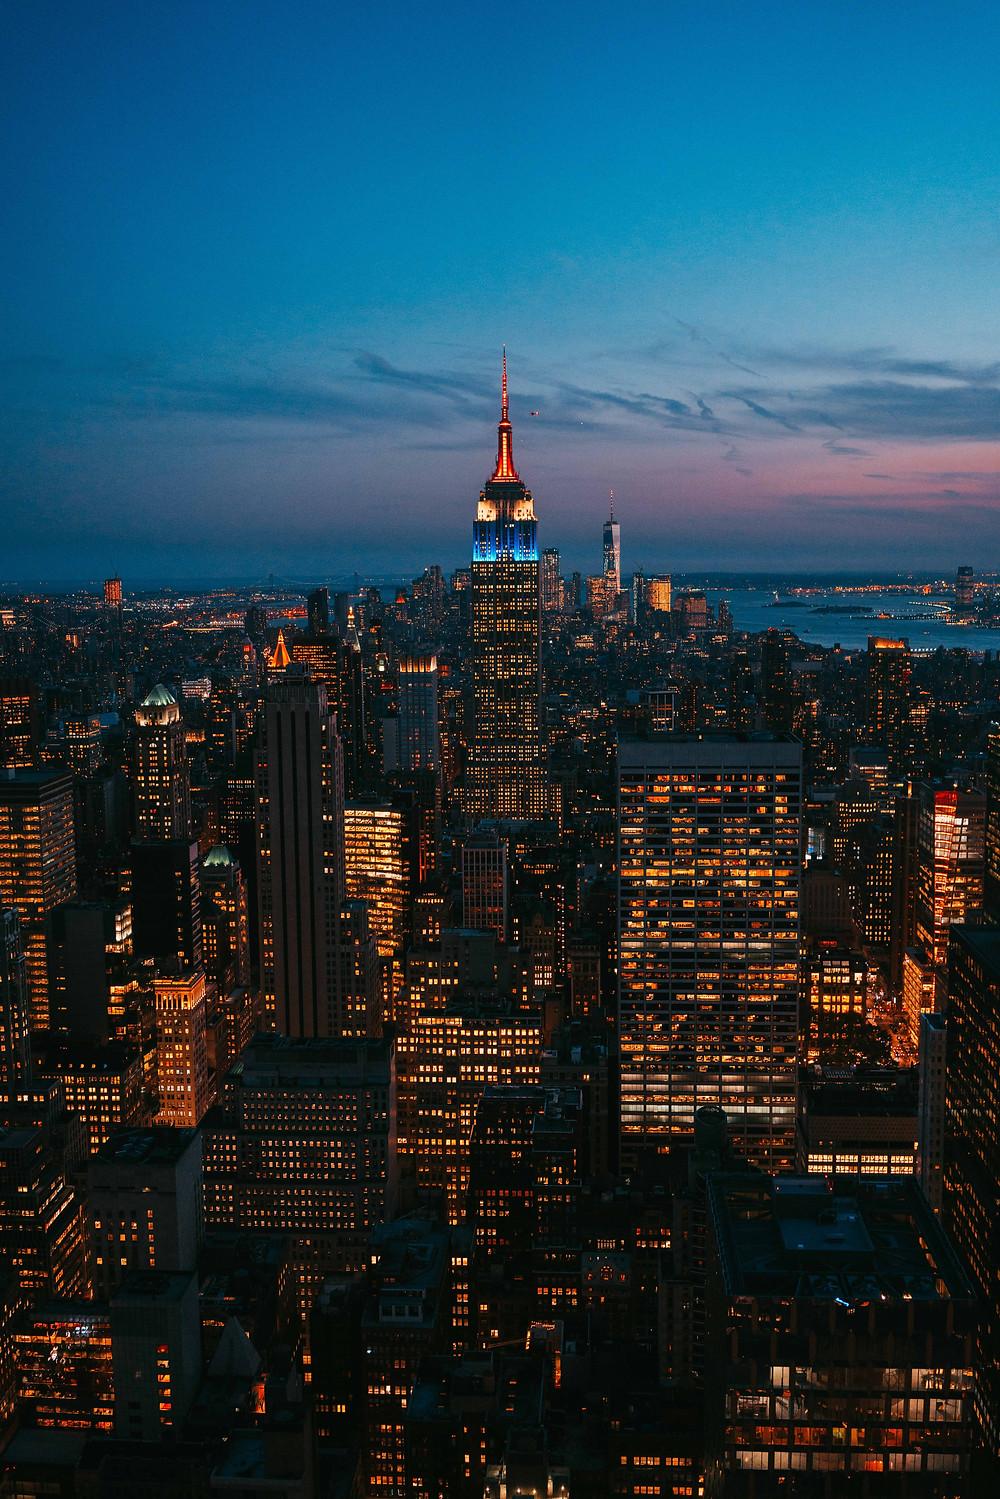 Graphic Design Studio|ARTS D ,位於紐約曼哈頓的 Wall Street,長度不超過一英里,寬僅11米,其壟斷全球的大型投資金融組織密集度居全球之冠。而透過各種高度槓桿收購、風險投資、成長資本、天使投資等等方式進行獲利的全球私募股權公司龍頭 KKR 、 Blackstone 以及透過多種金融工具在1992年襲擊英鎊、1997年亞洲金融風暴中,襲擊泰國、馬來西亞等國的貨幣而得利的 Quantum Group 量子基金總部也設立於此。